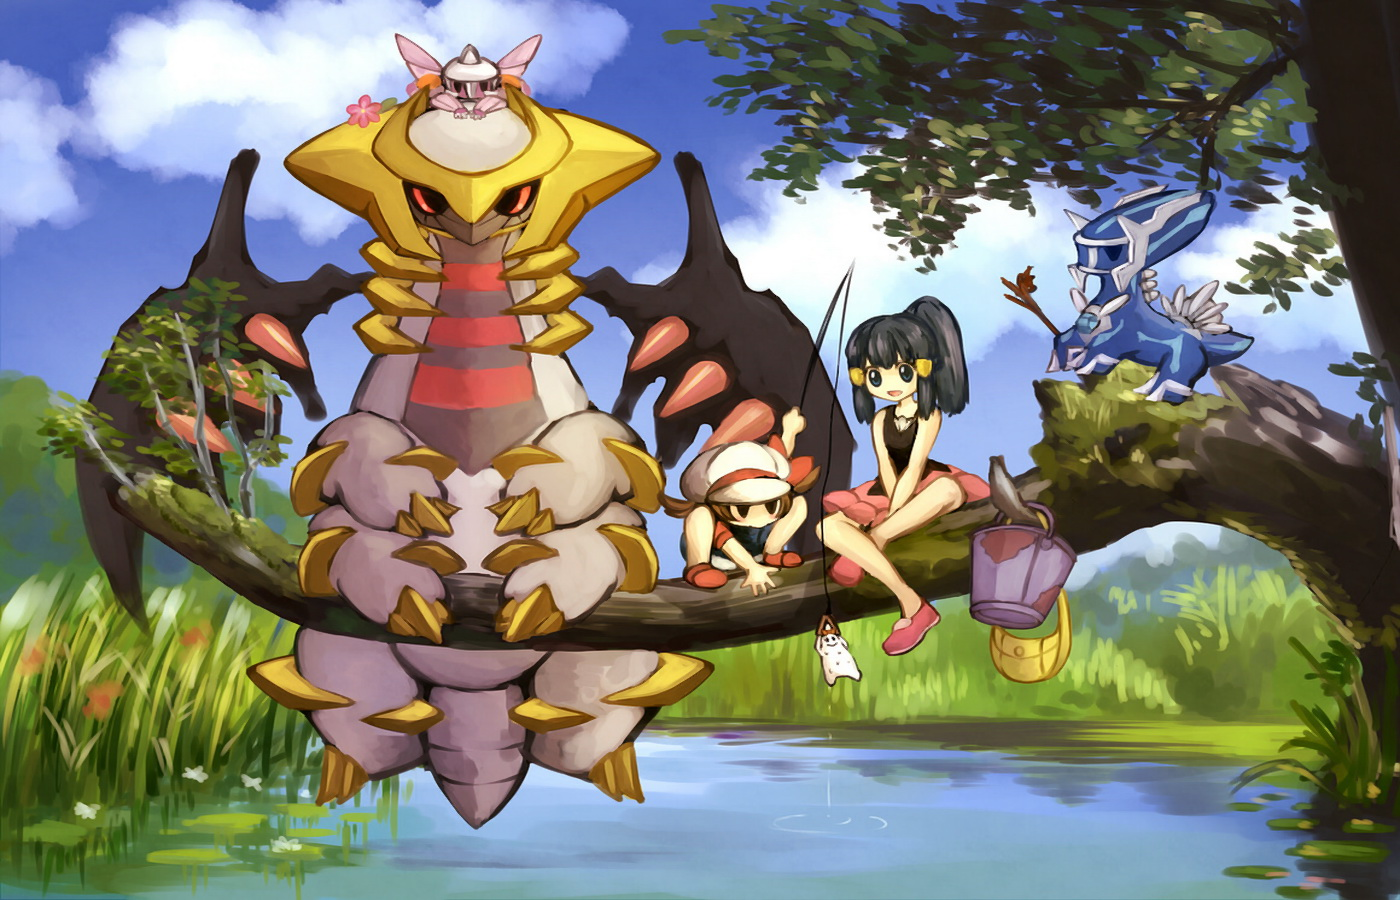 Fonds D Ecran Pocket Monster Anime Telecharger Photo